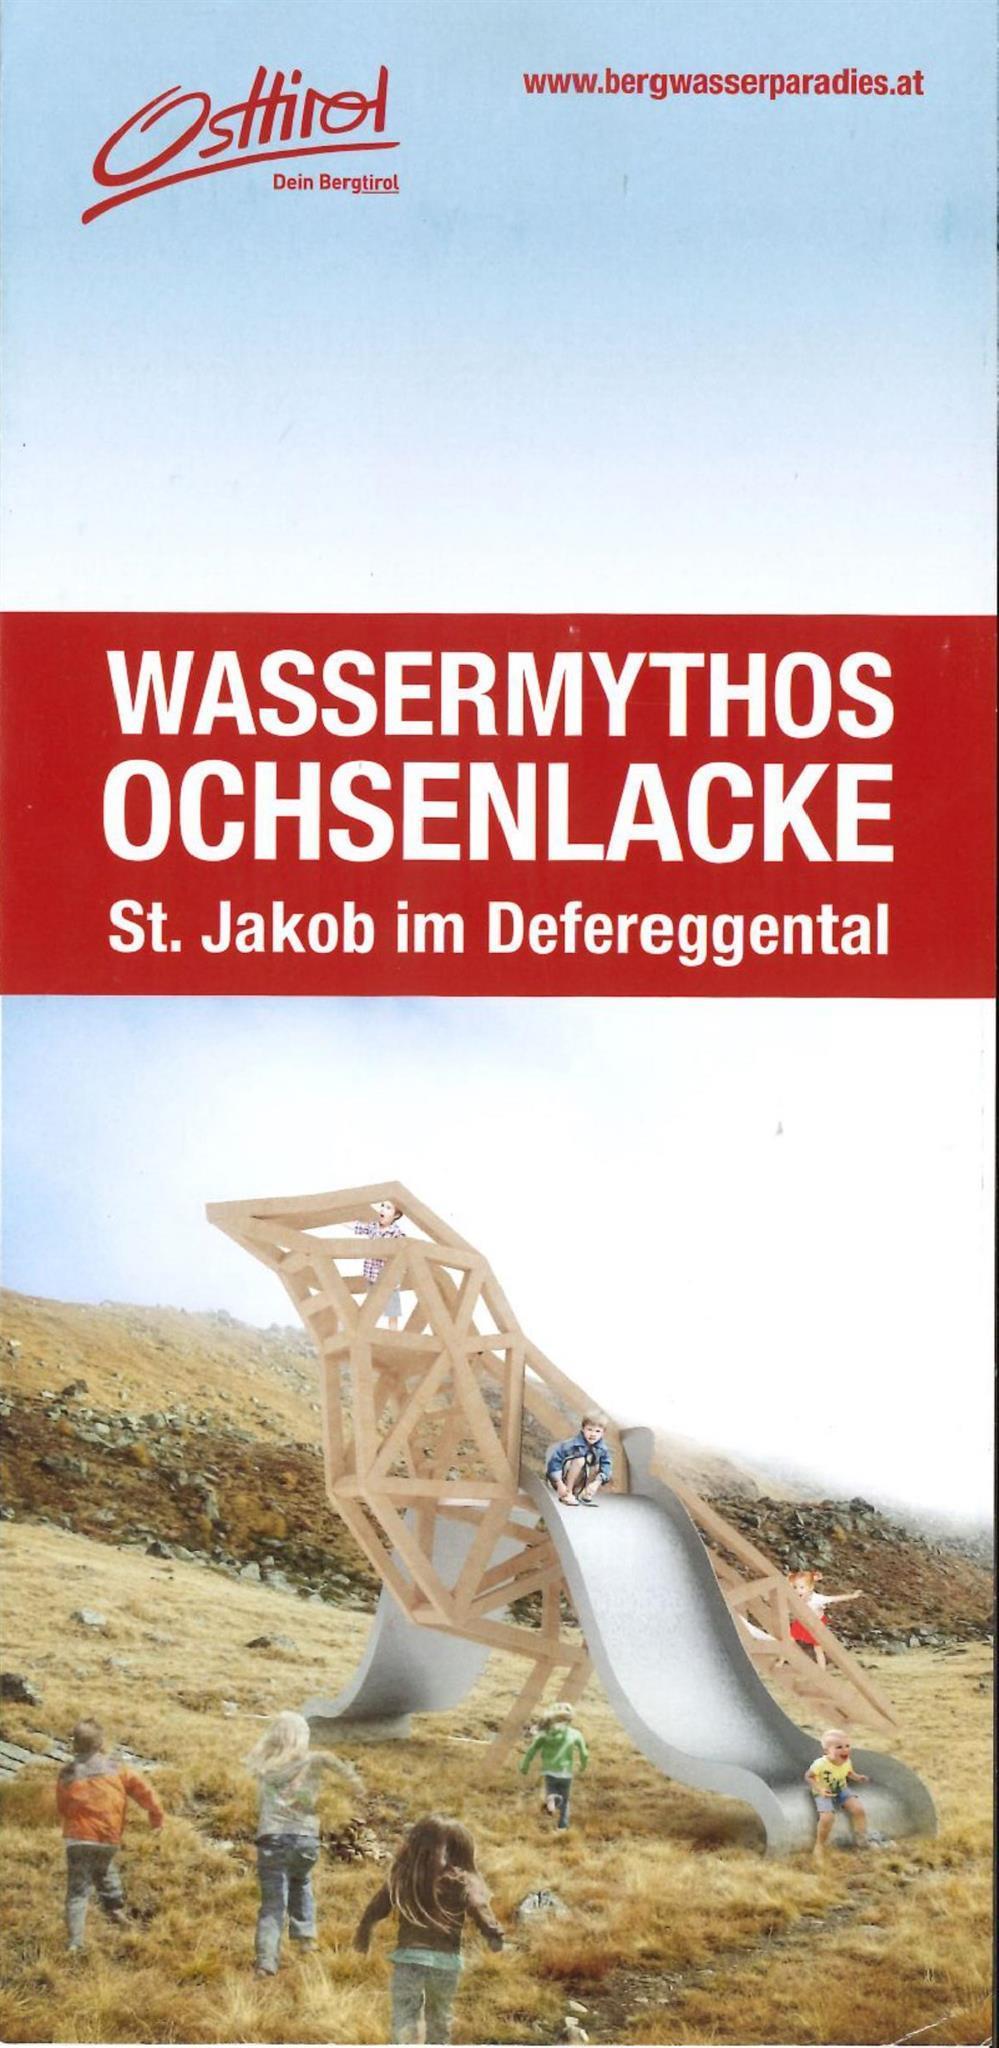 Wassermythos-Ochsenlacke.jpg